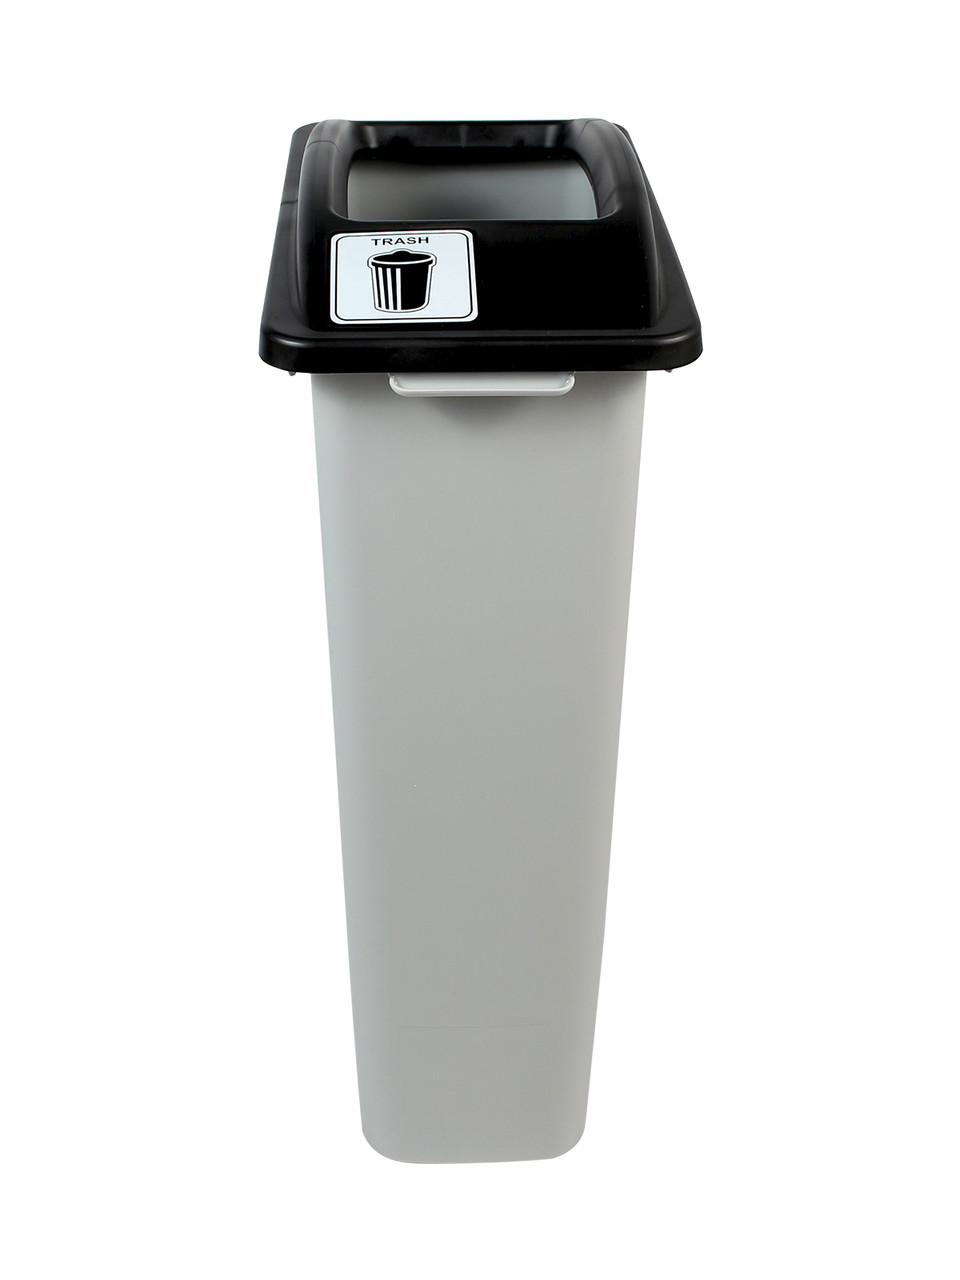 23 Gallon Skinny Simple Sort Trash Can